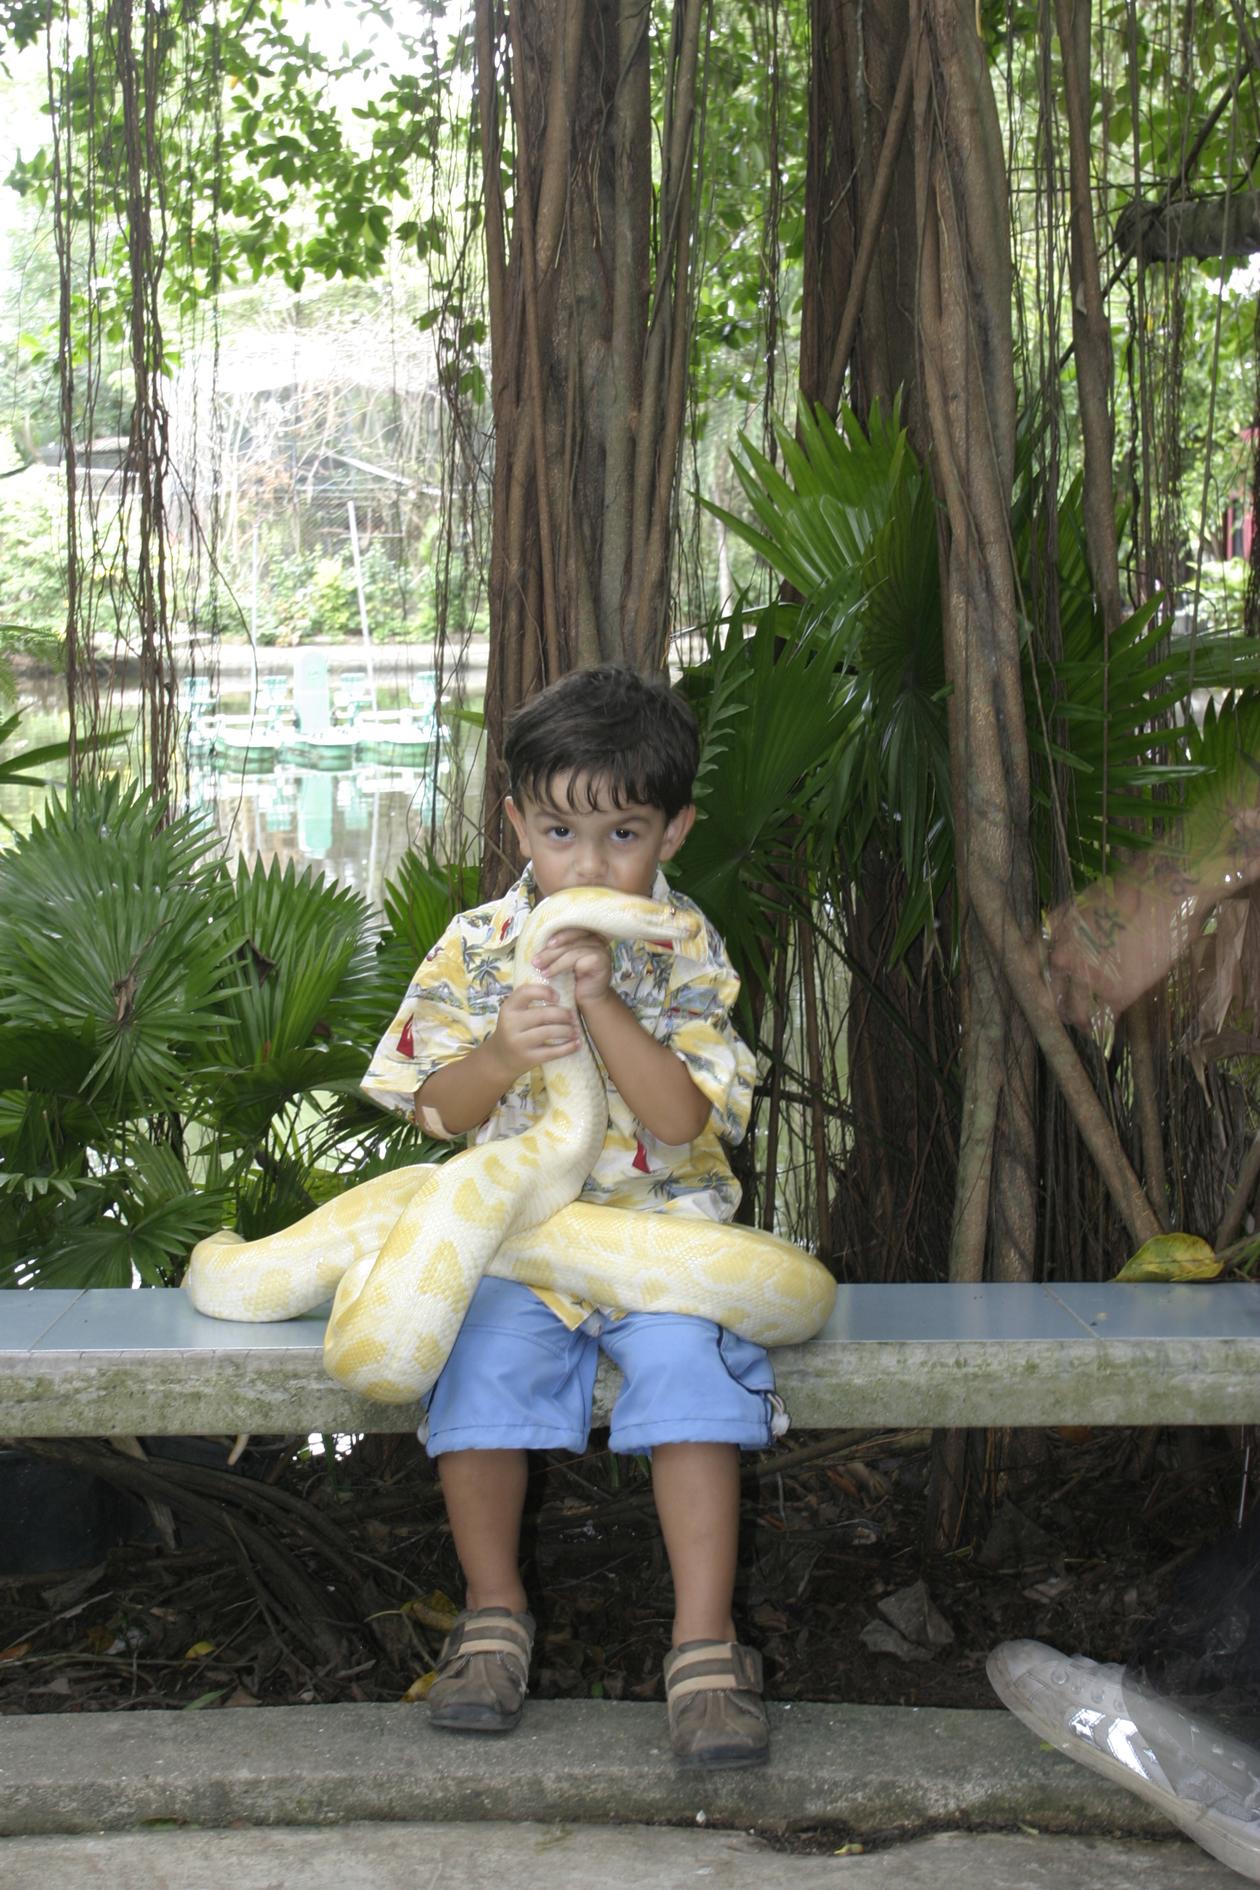 kissing_snake_phuket_thailand_zoo_2007